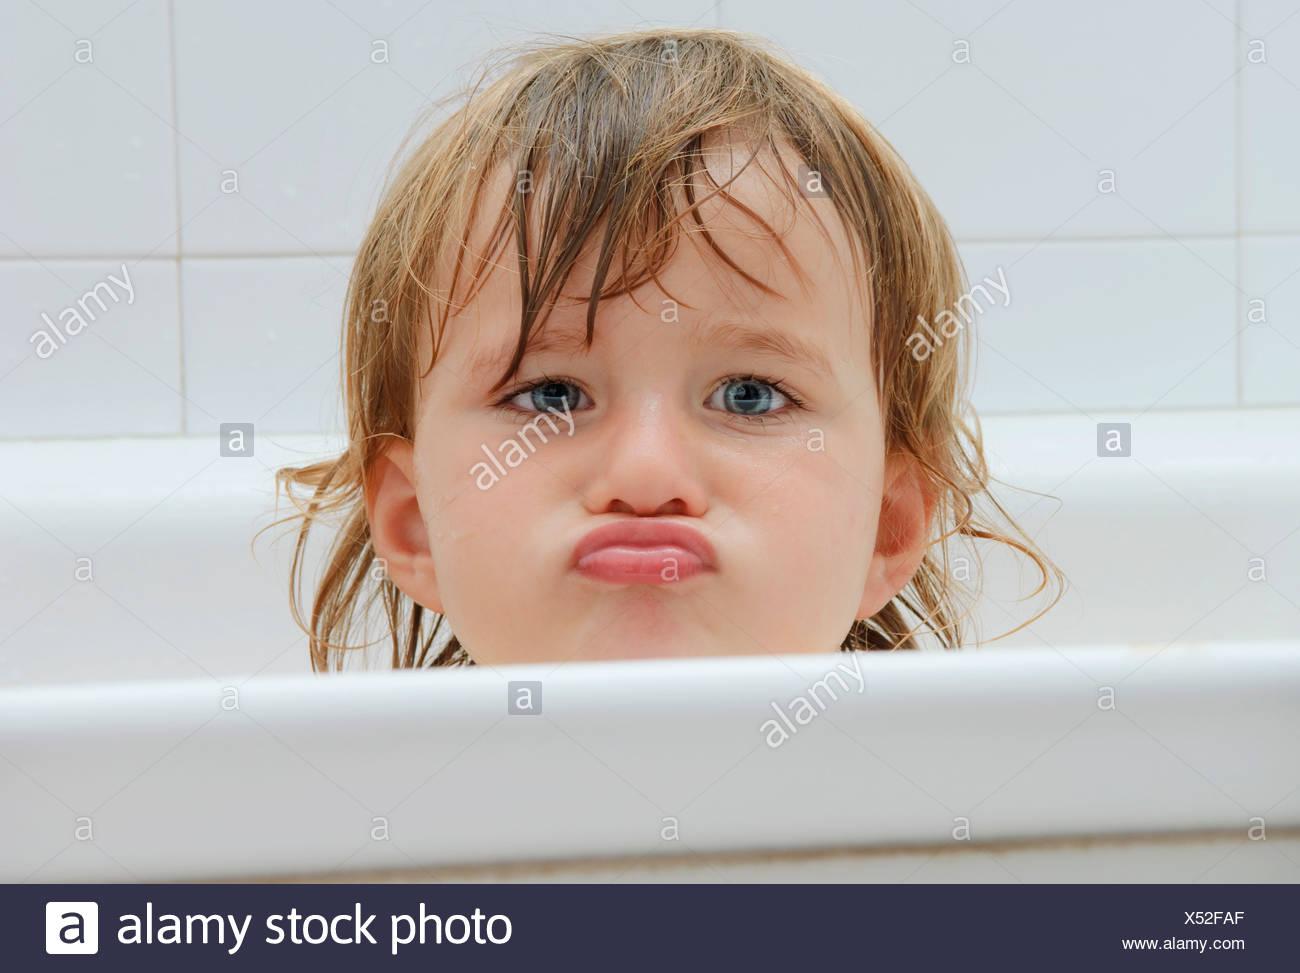 Chica en la bañera, faneca Foto de stock